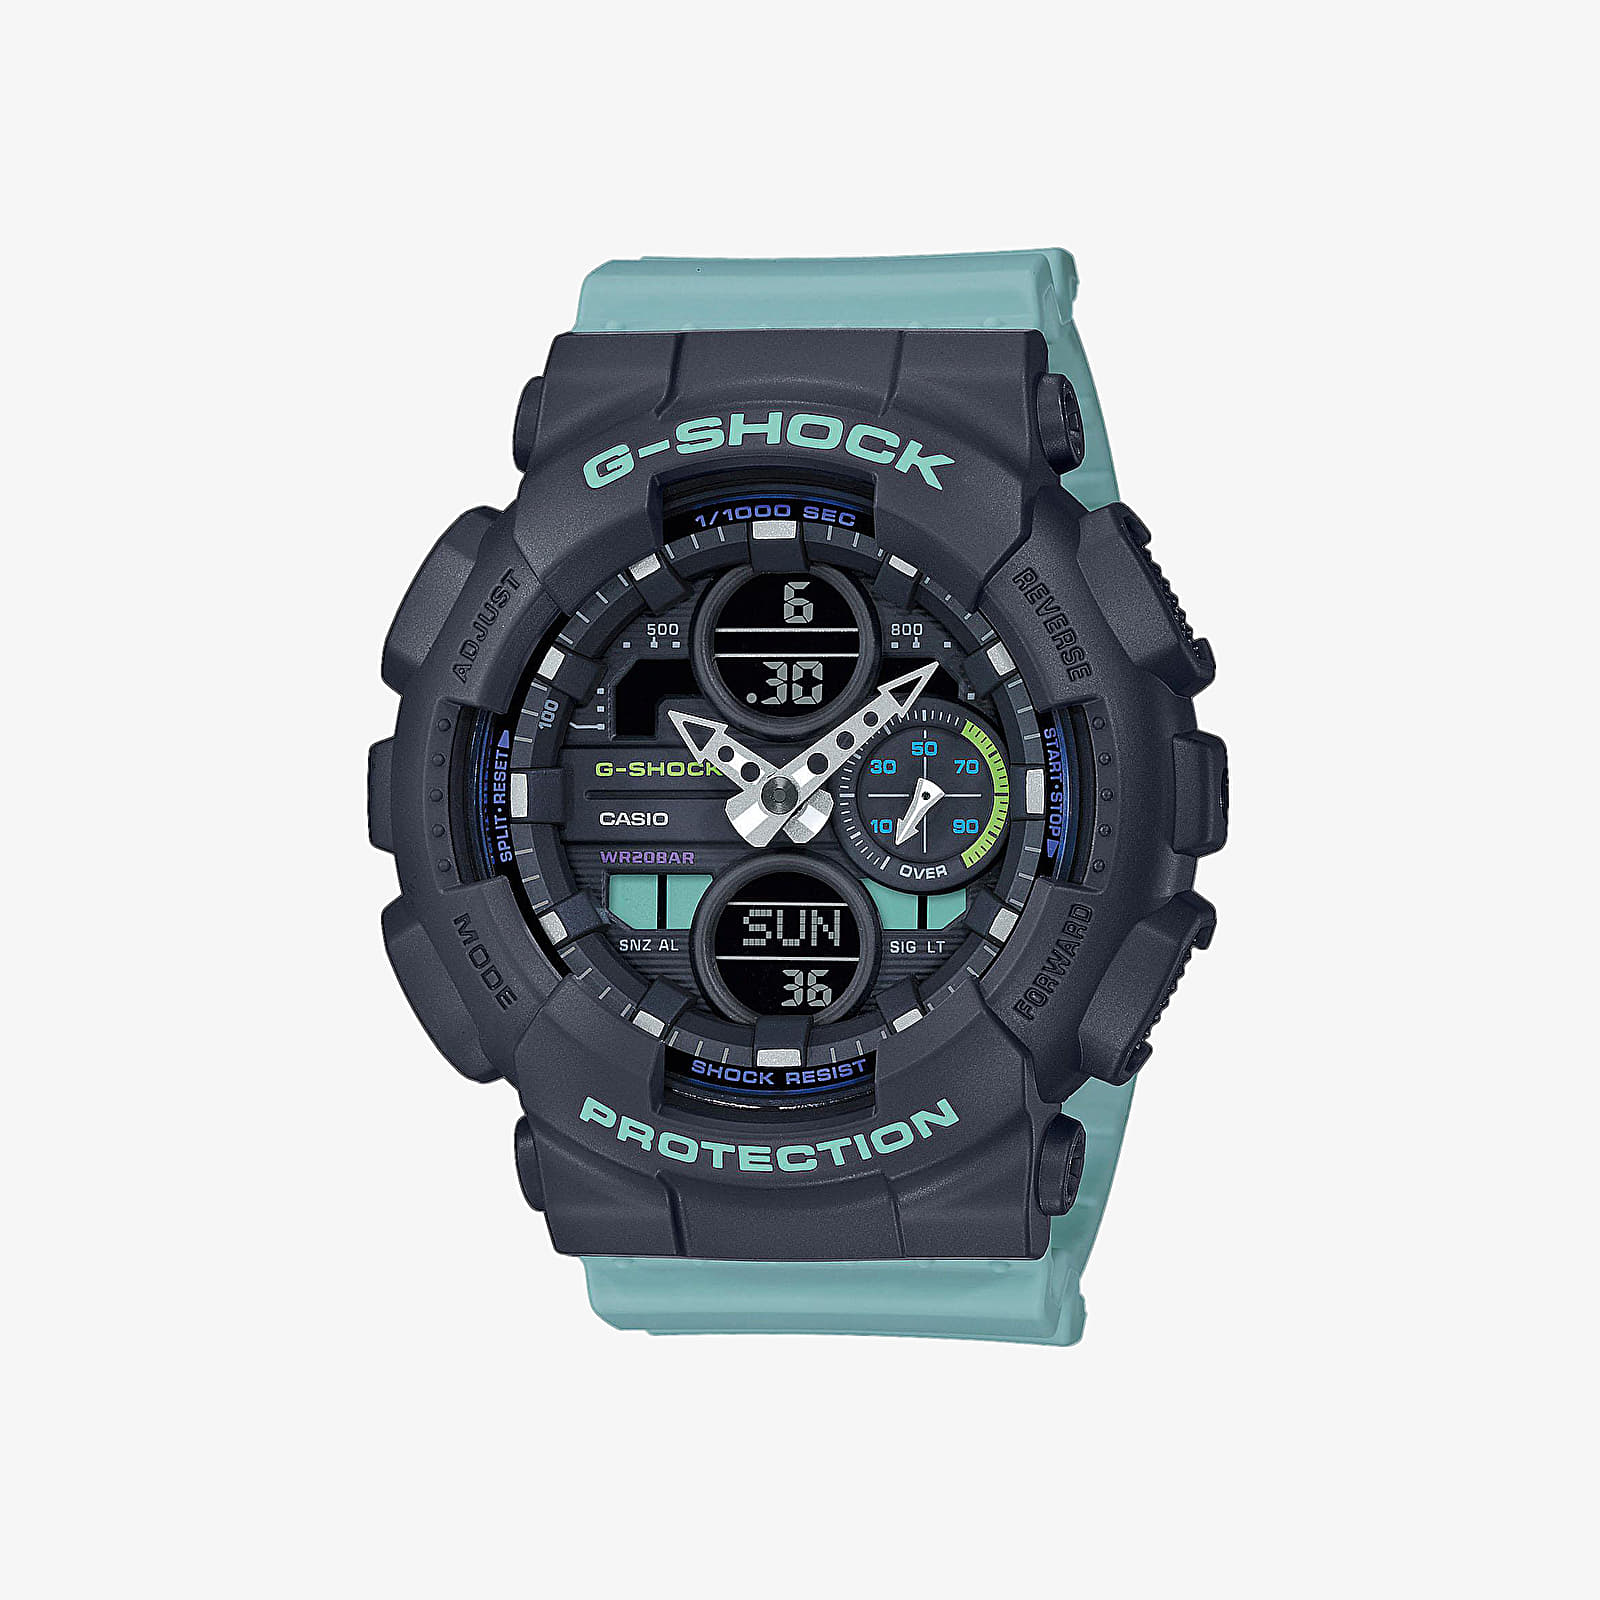 Casio G-Shock GMA-S140-2AER Watch